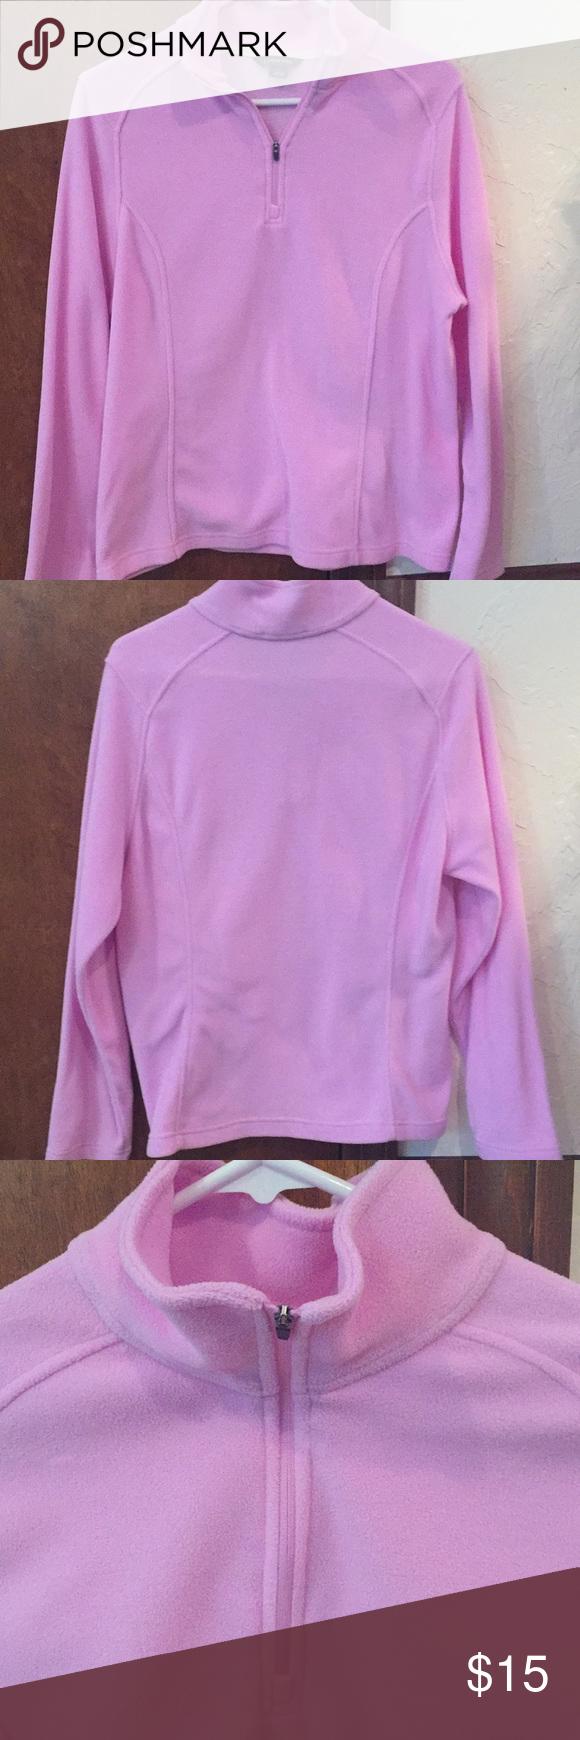 Lands End Pullover Clothes Design Quarter Zip Pullover Fashion [ 1740 x 580 Pixel ]